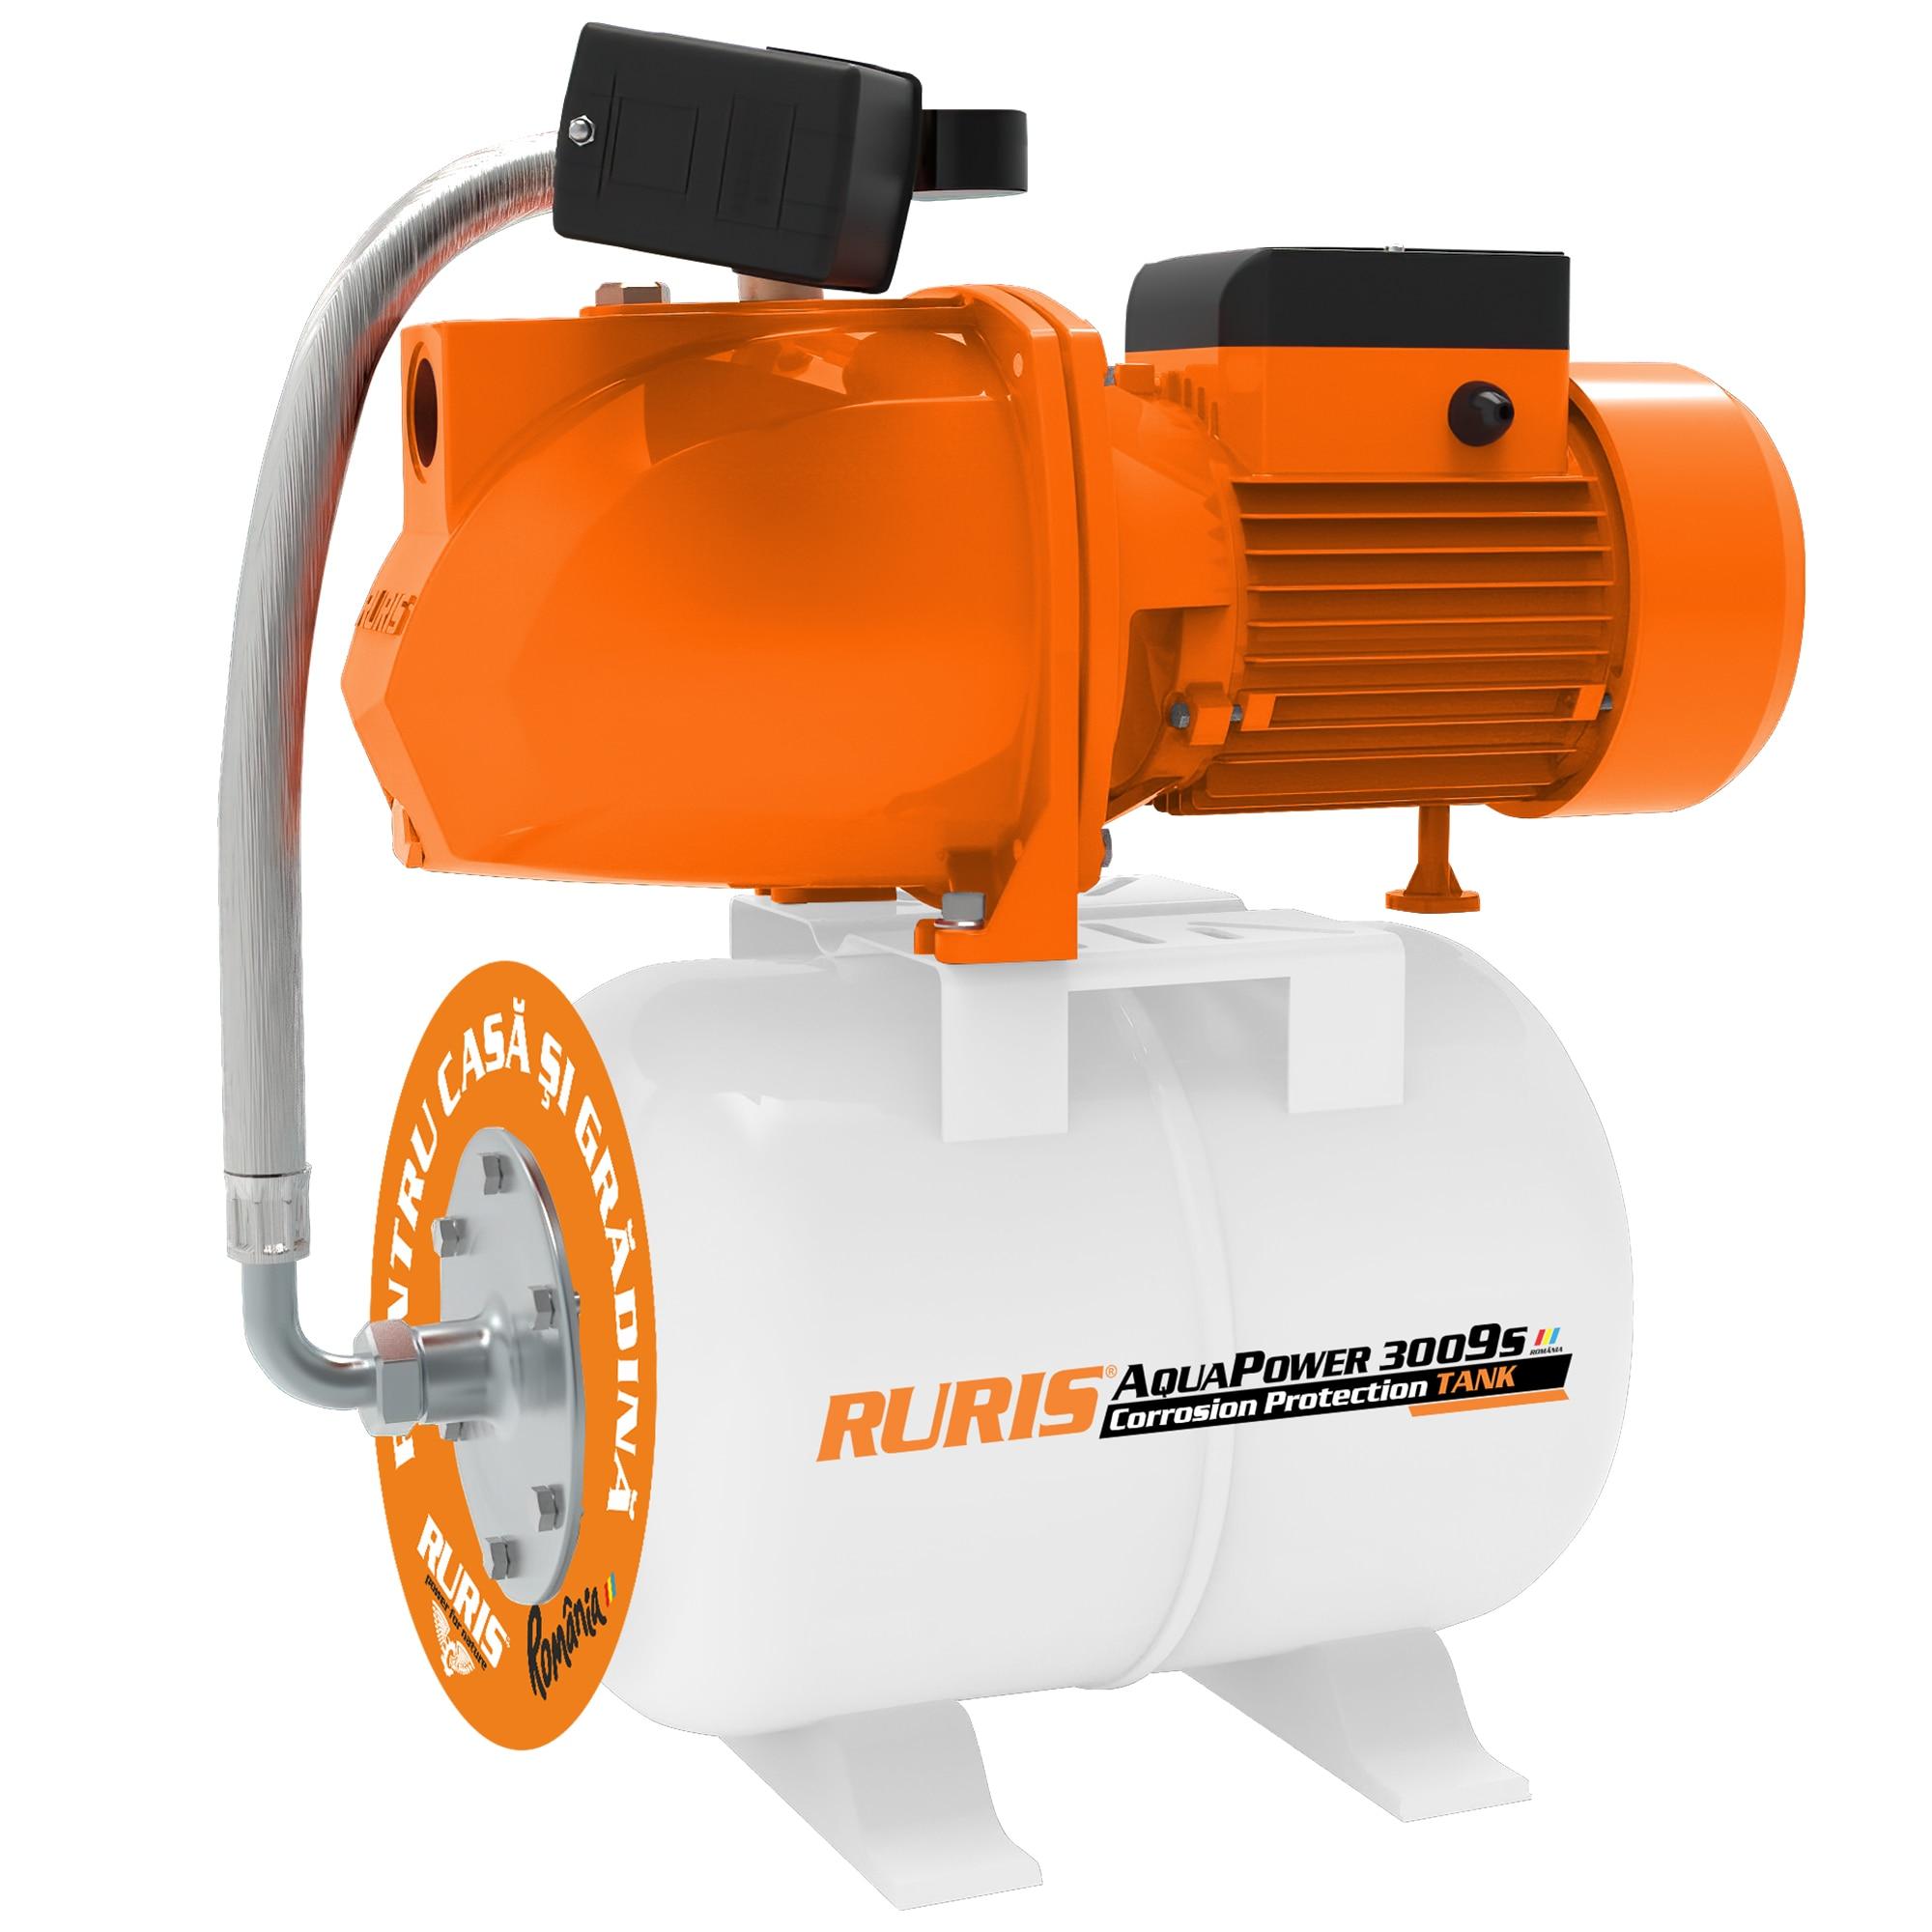 Fotografie Hidrofor RURIS aquapower 3009S, 1500 W, 24 l, debit 55 l/min, refulare 60 m inaltime refulare, 9 m adancime absorbtie